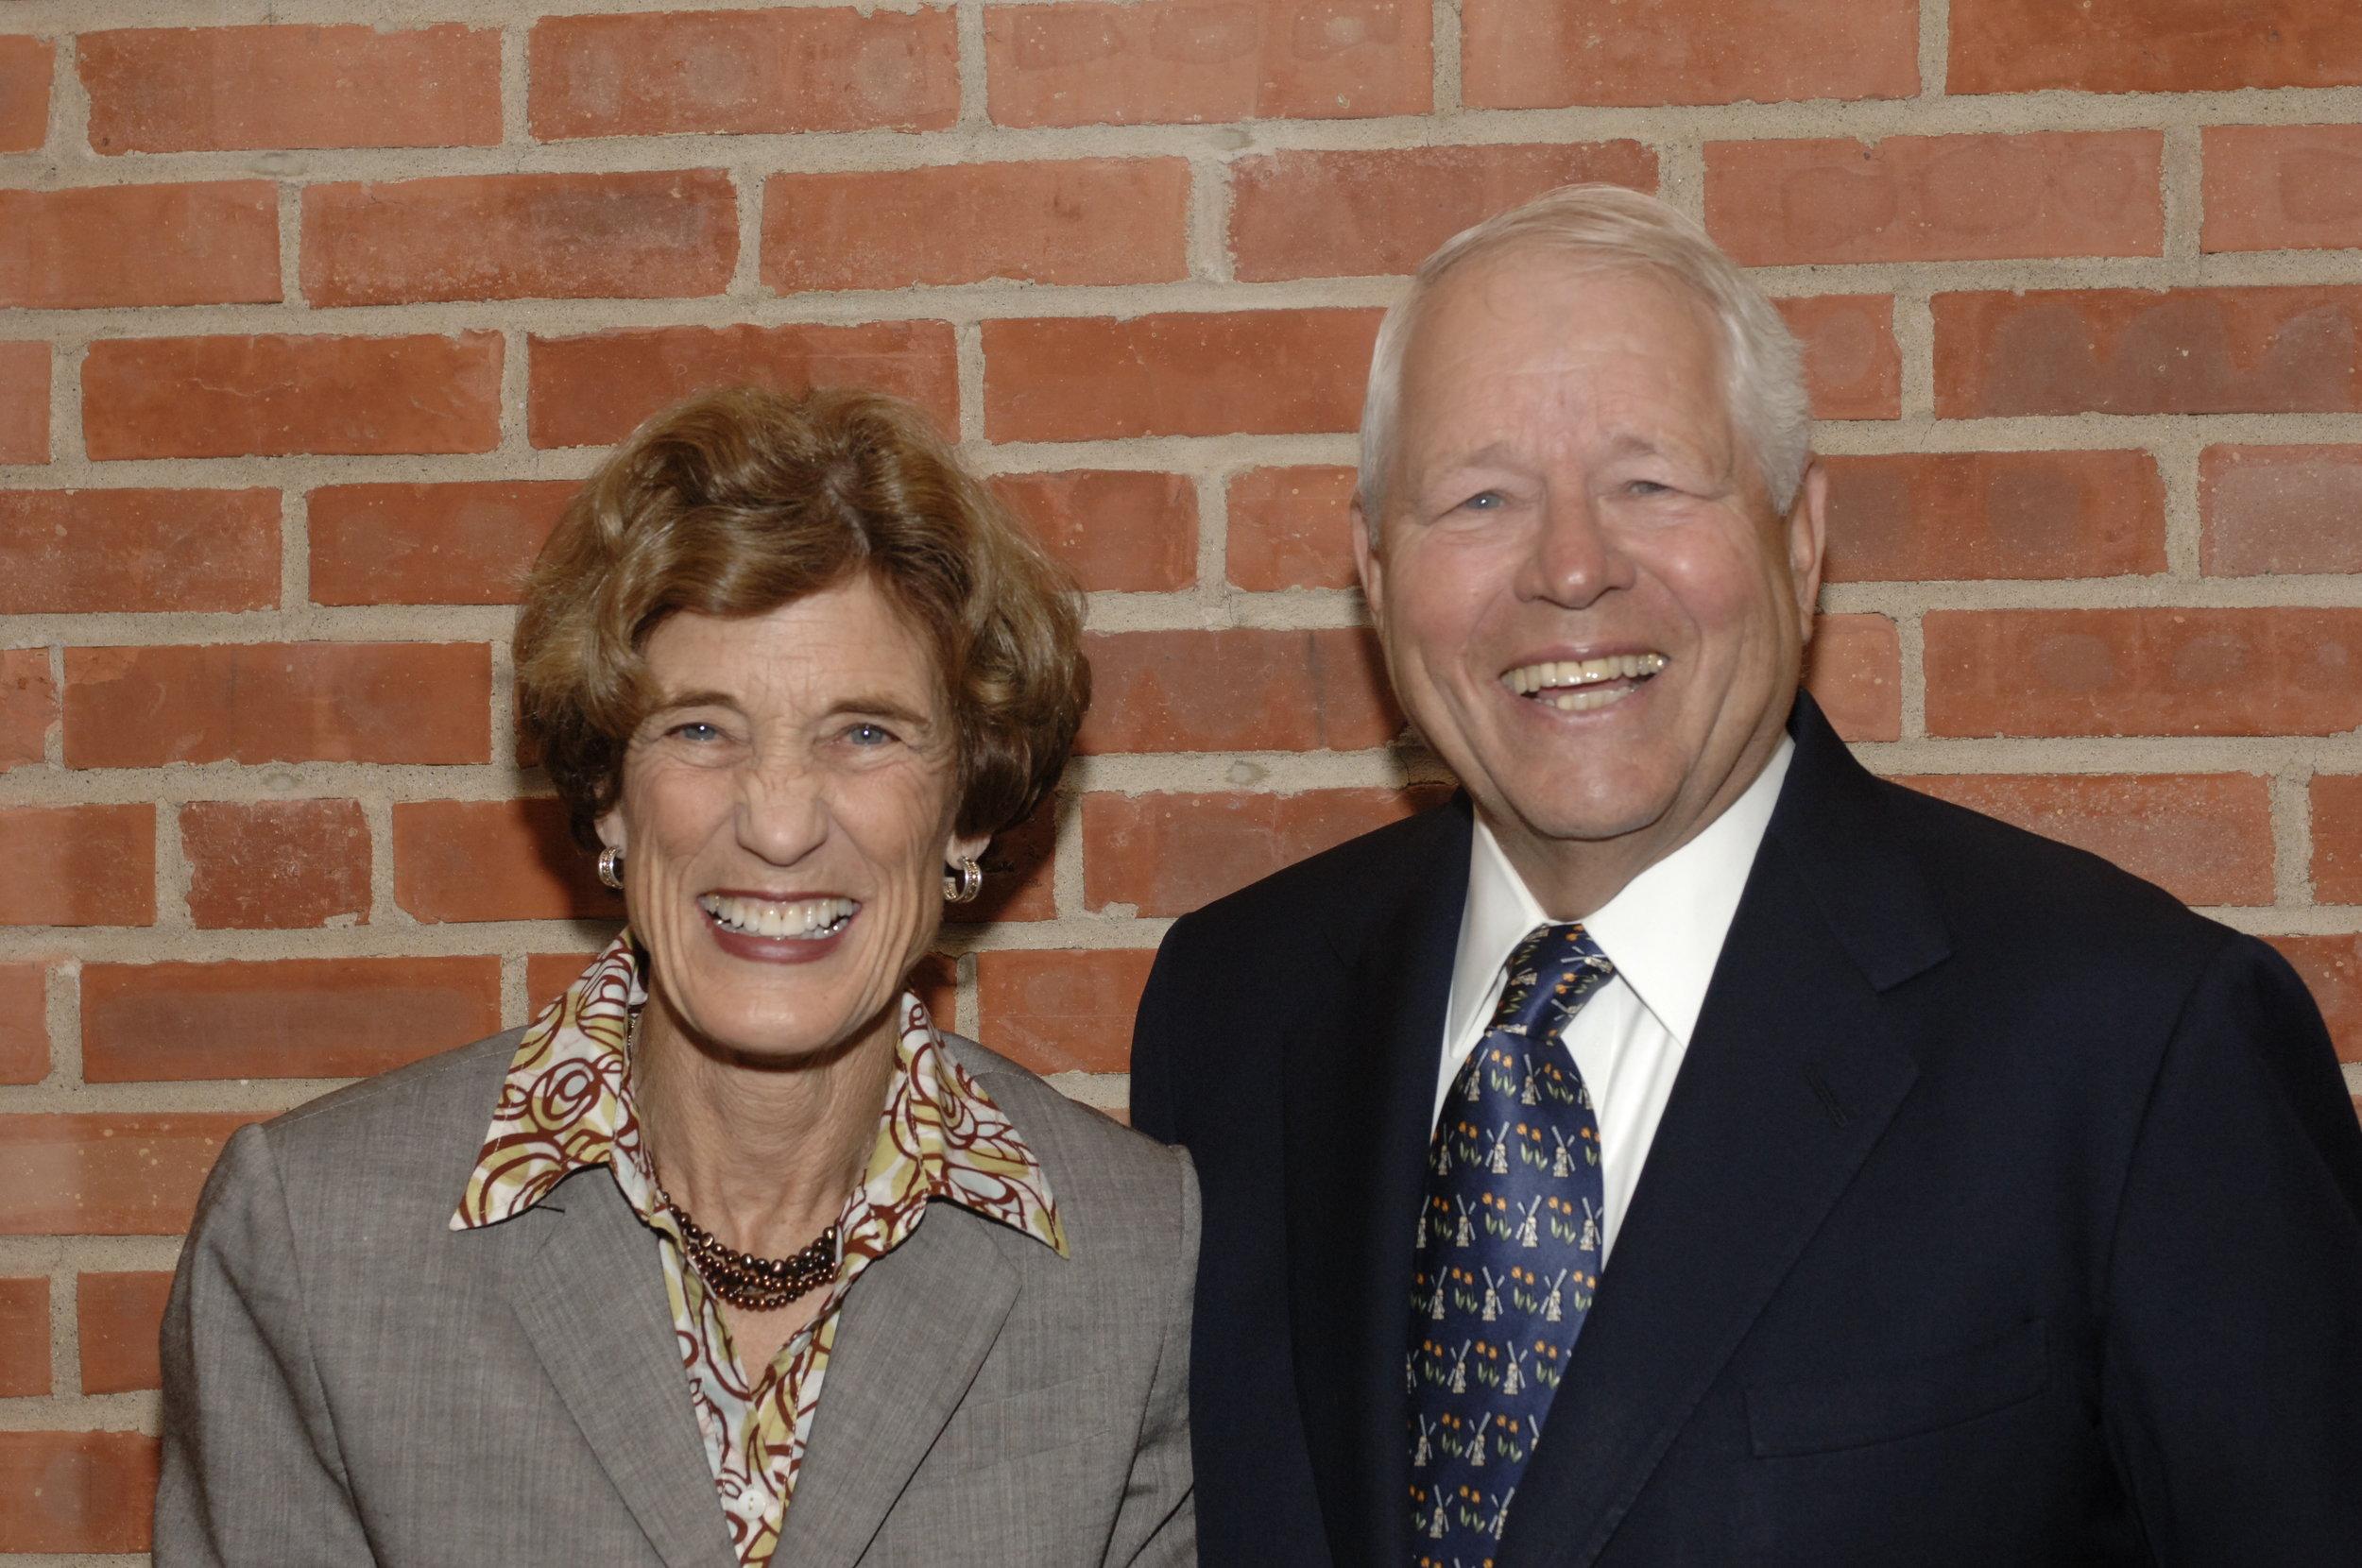 Pat and Mike Koldyke.JPG